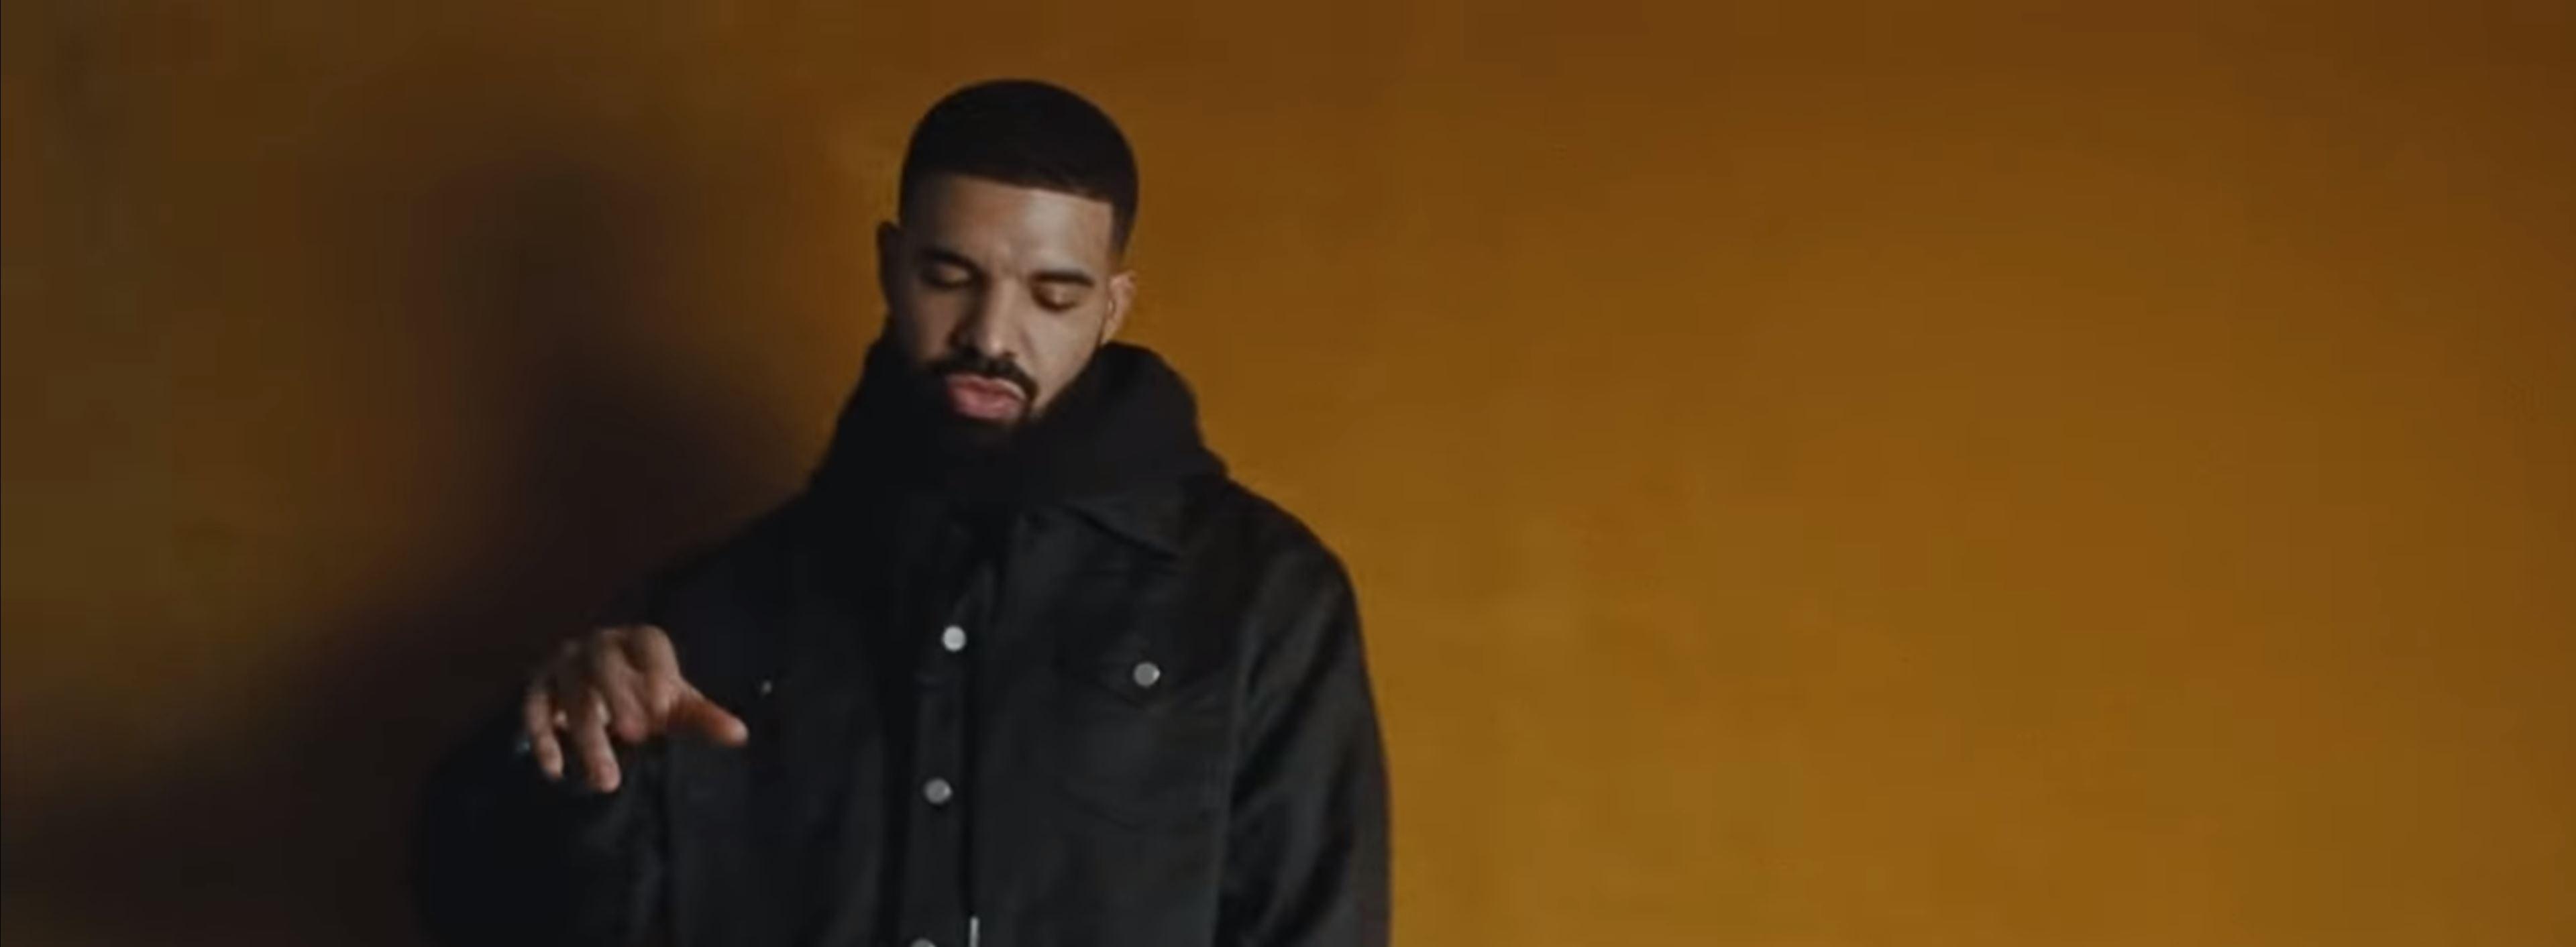 138 No Stylist by Drake